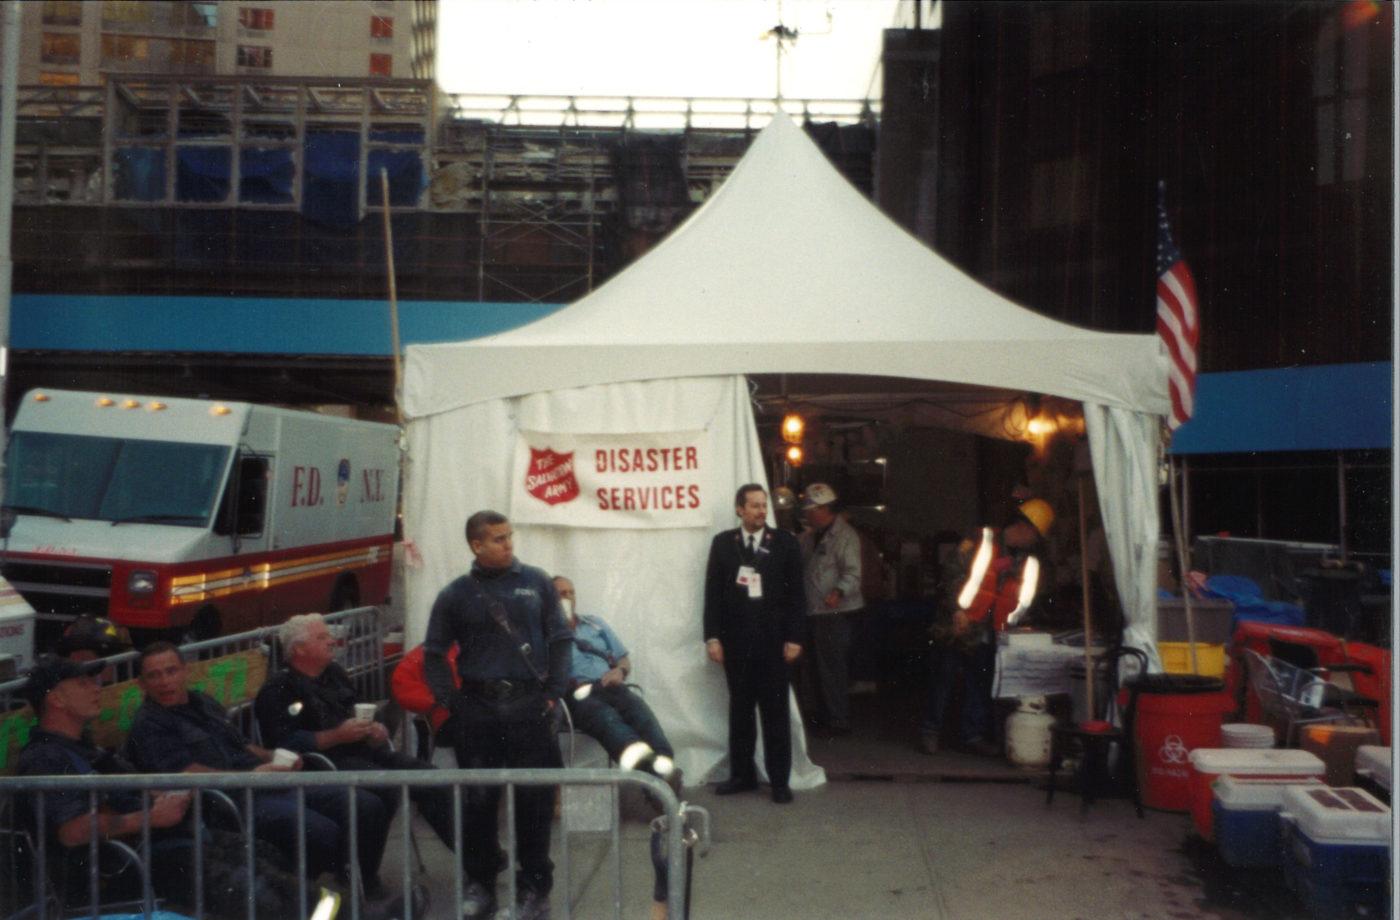 Salvation Army Tent at Ground Zero